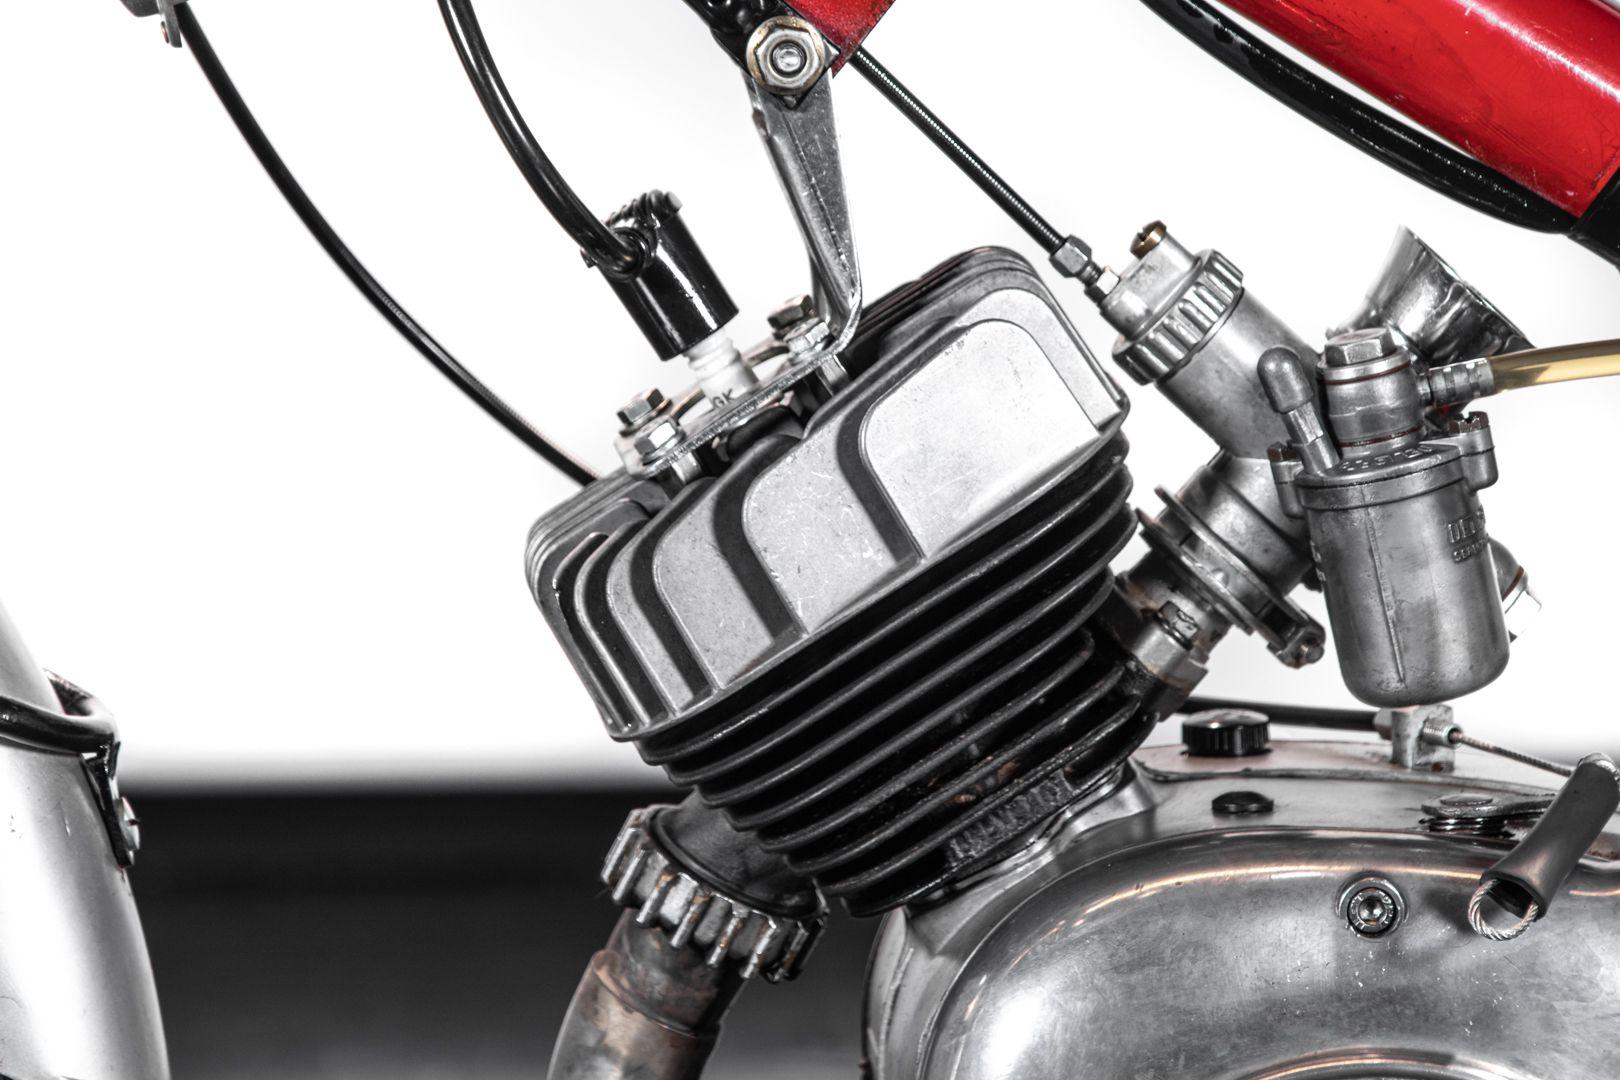 1958 Italjet Minarelli 50 71016